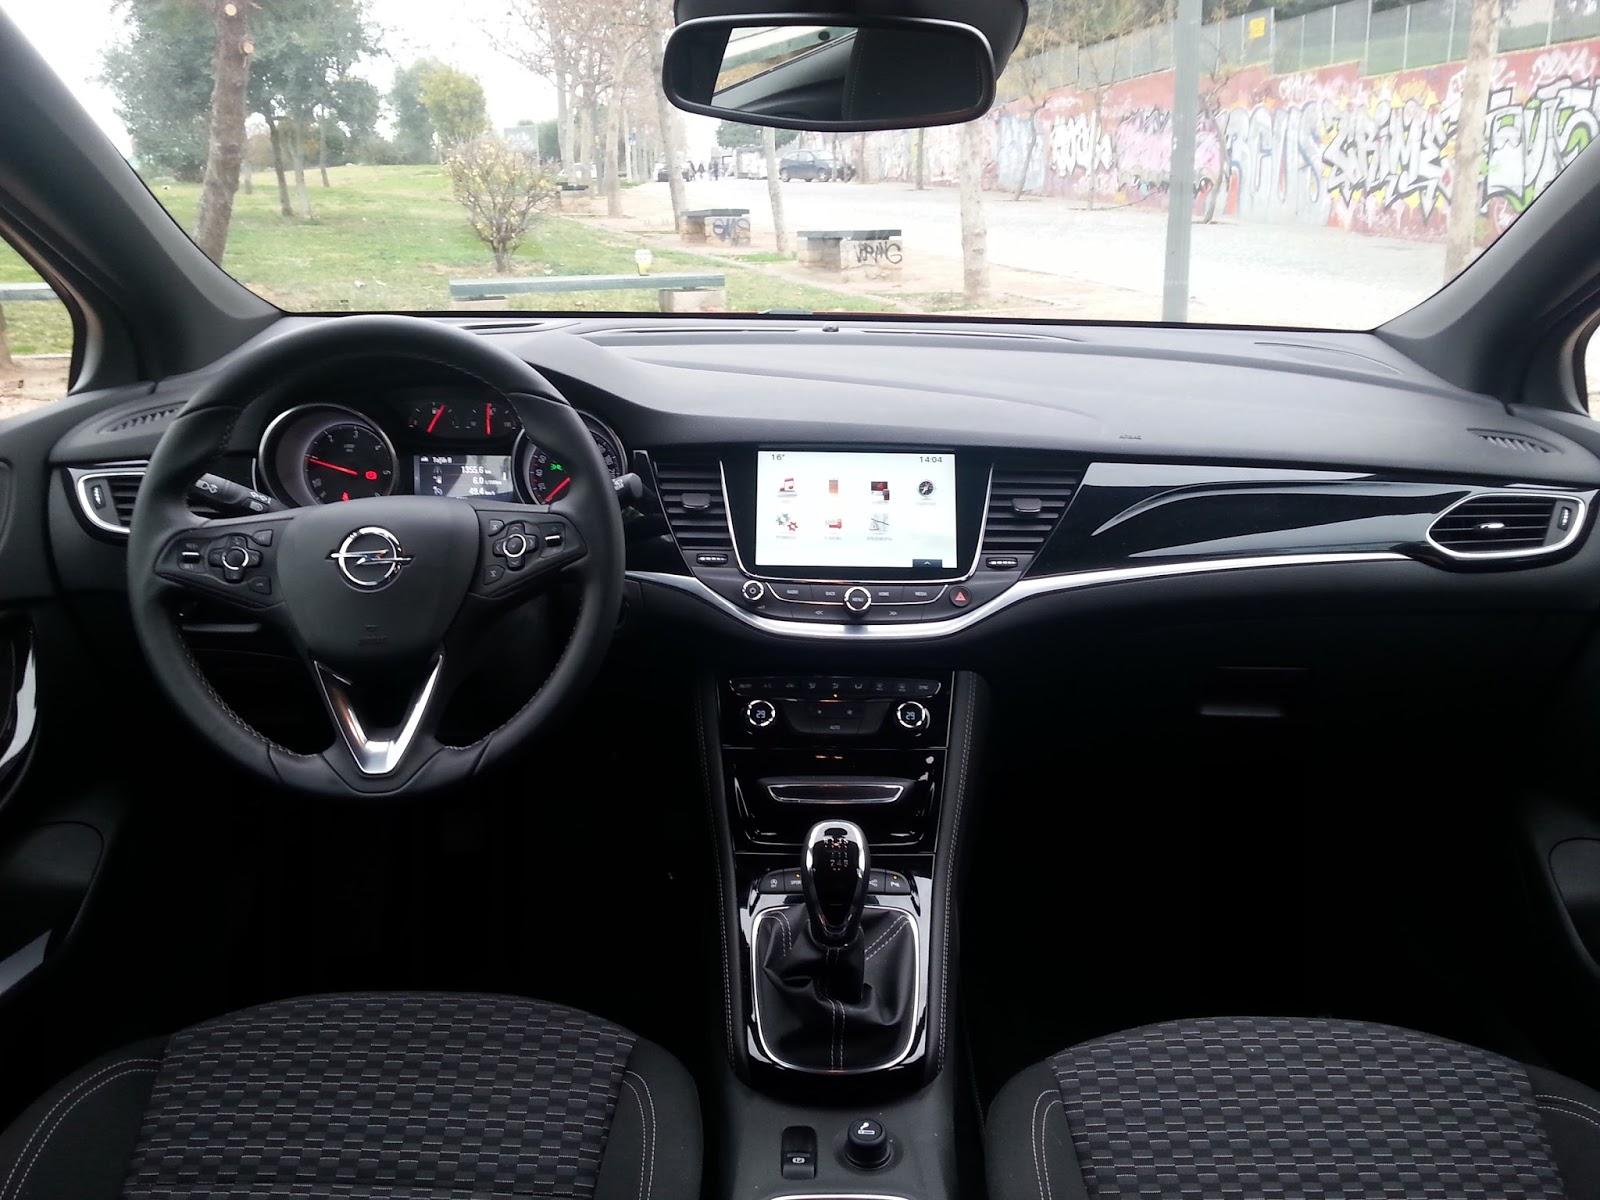 astratsinterior Πόσο αστέρι είναι, τελικά, το νέο Astra; Diesel, Opel, Opel Astra, TEST, zblog, ΔΟΚΙΜΕΣ, οδηγούμε